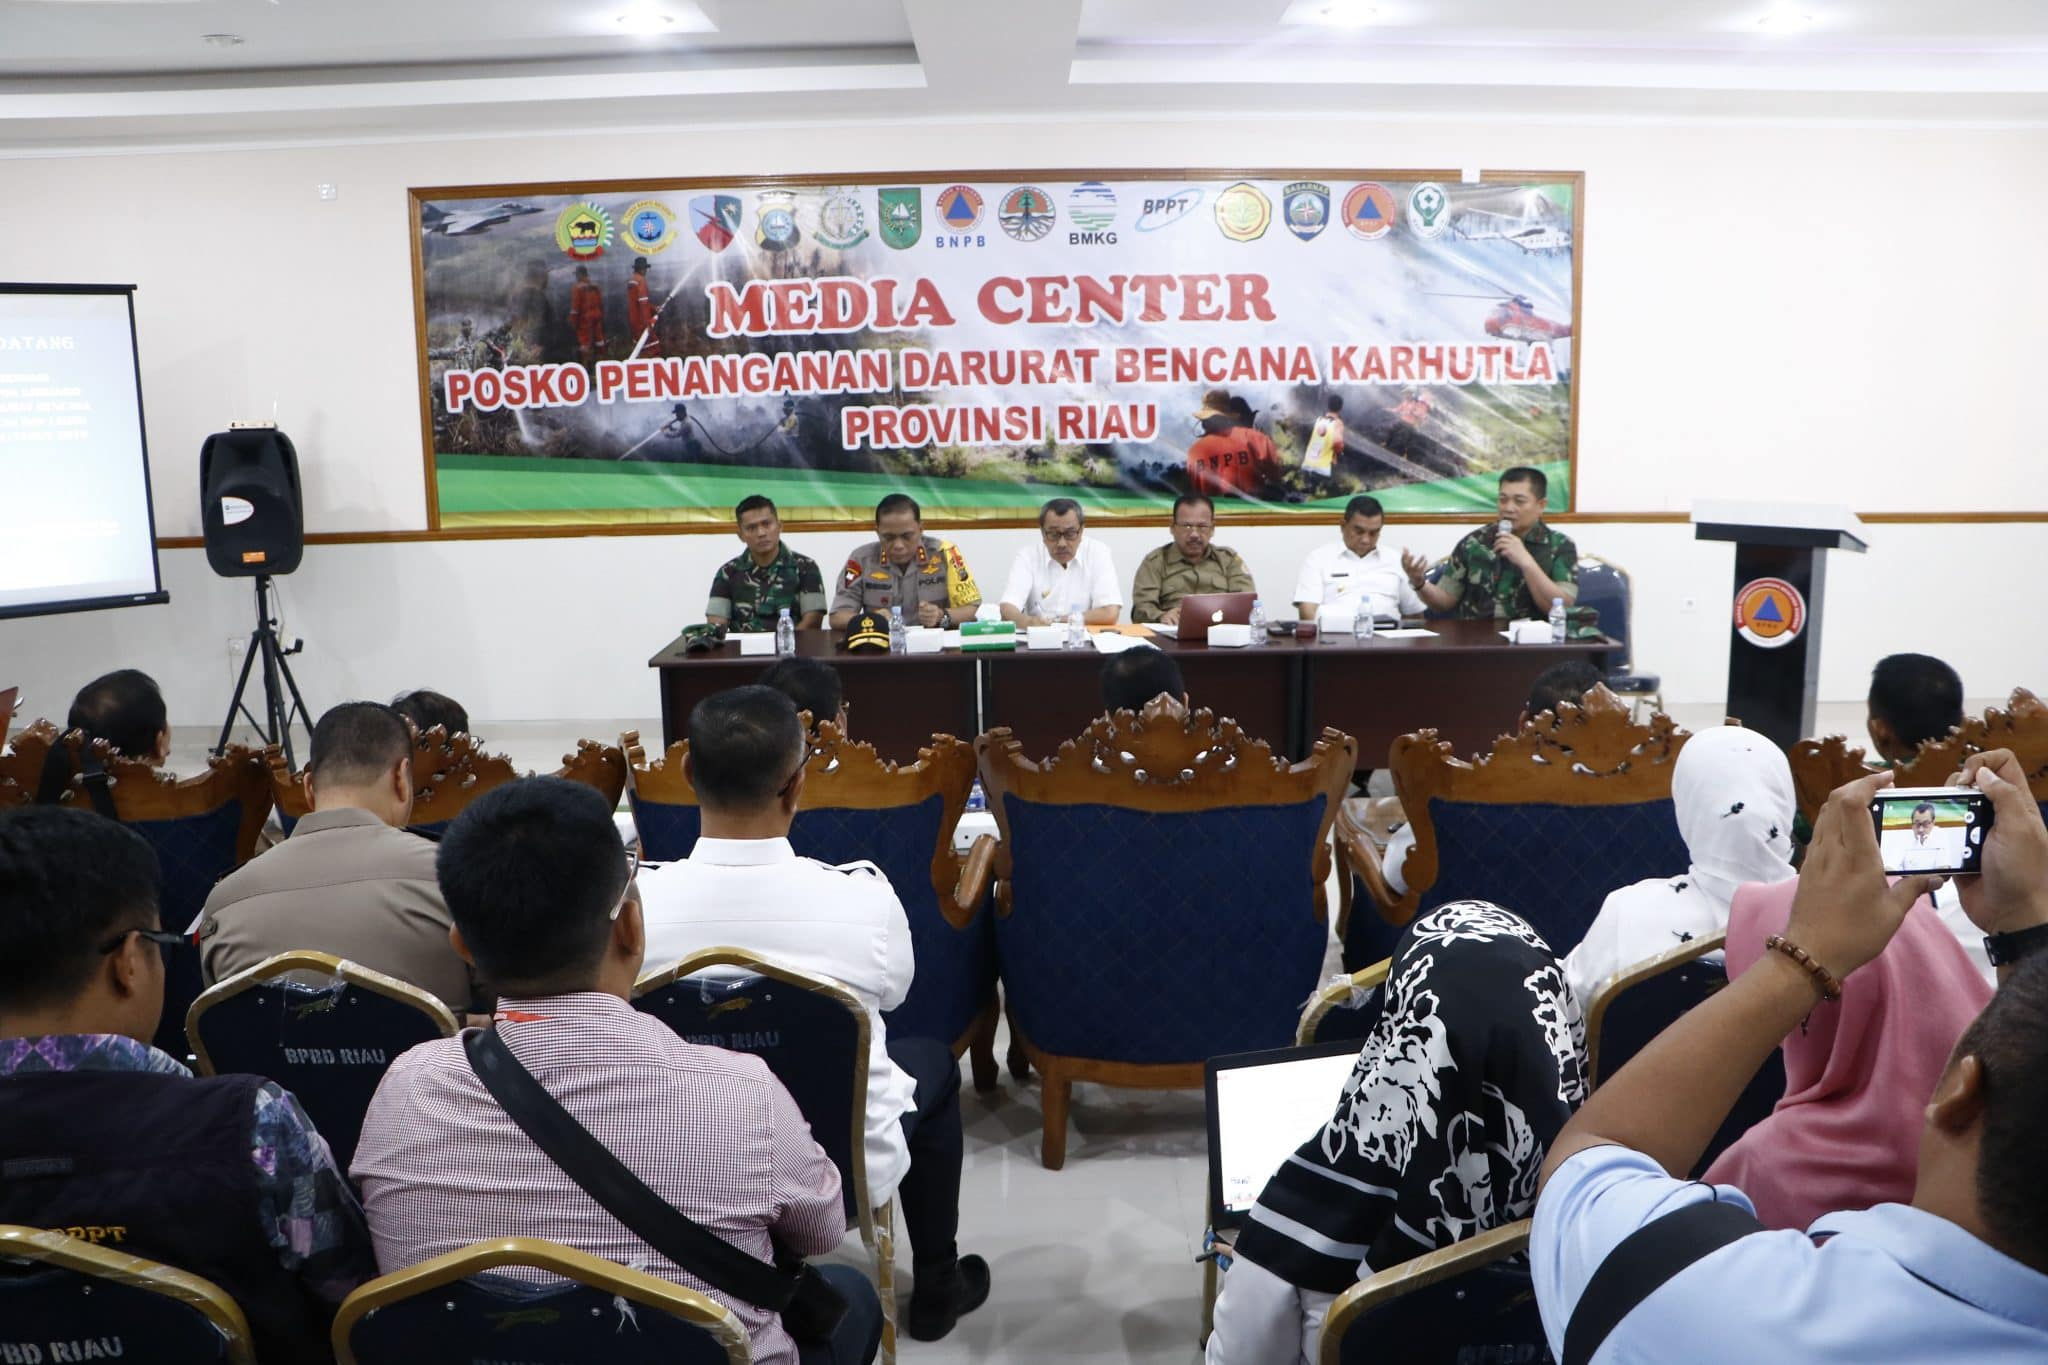 Rapat Koordinasi Satgas Karhutla di Prov. Riau Tahun 2019